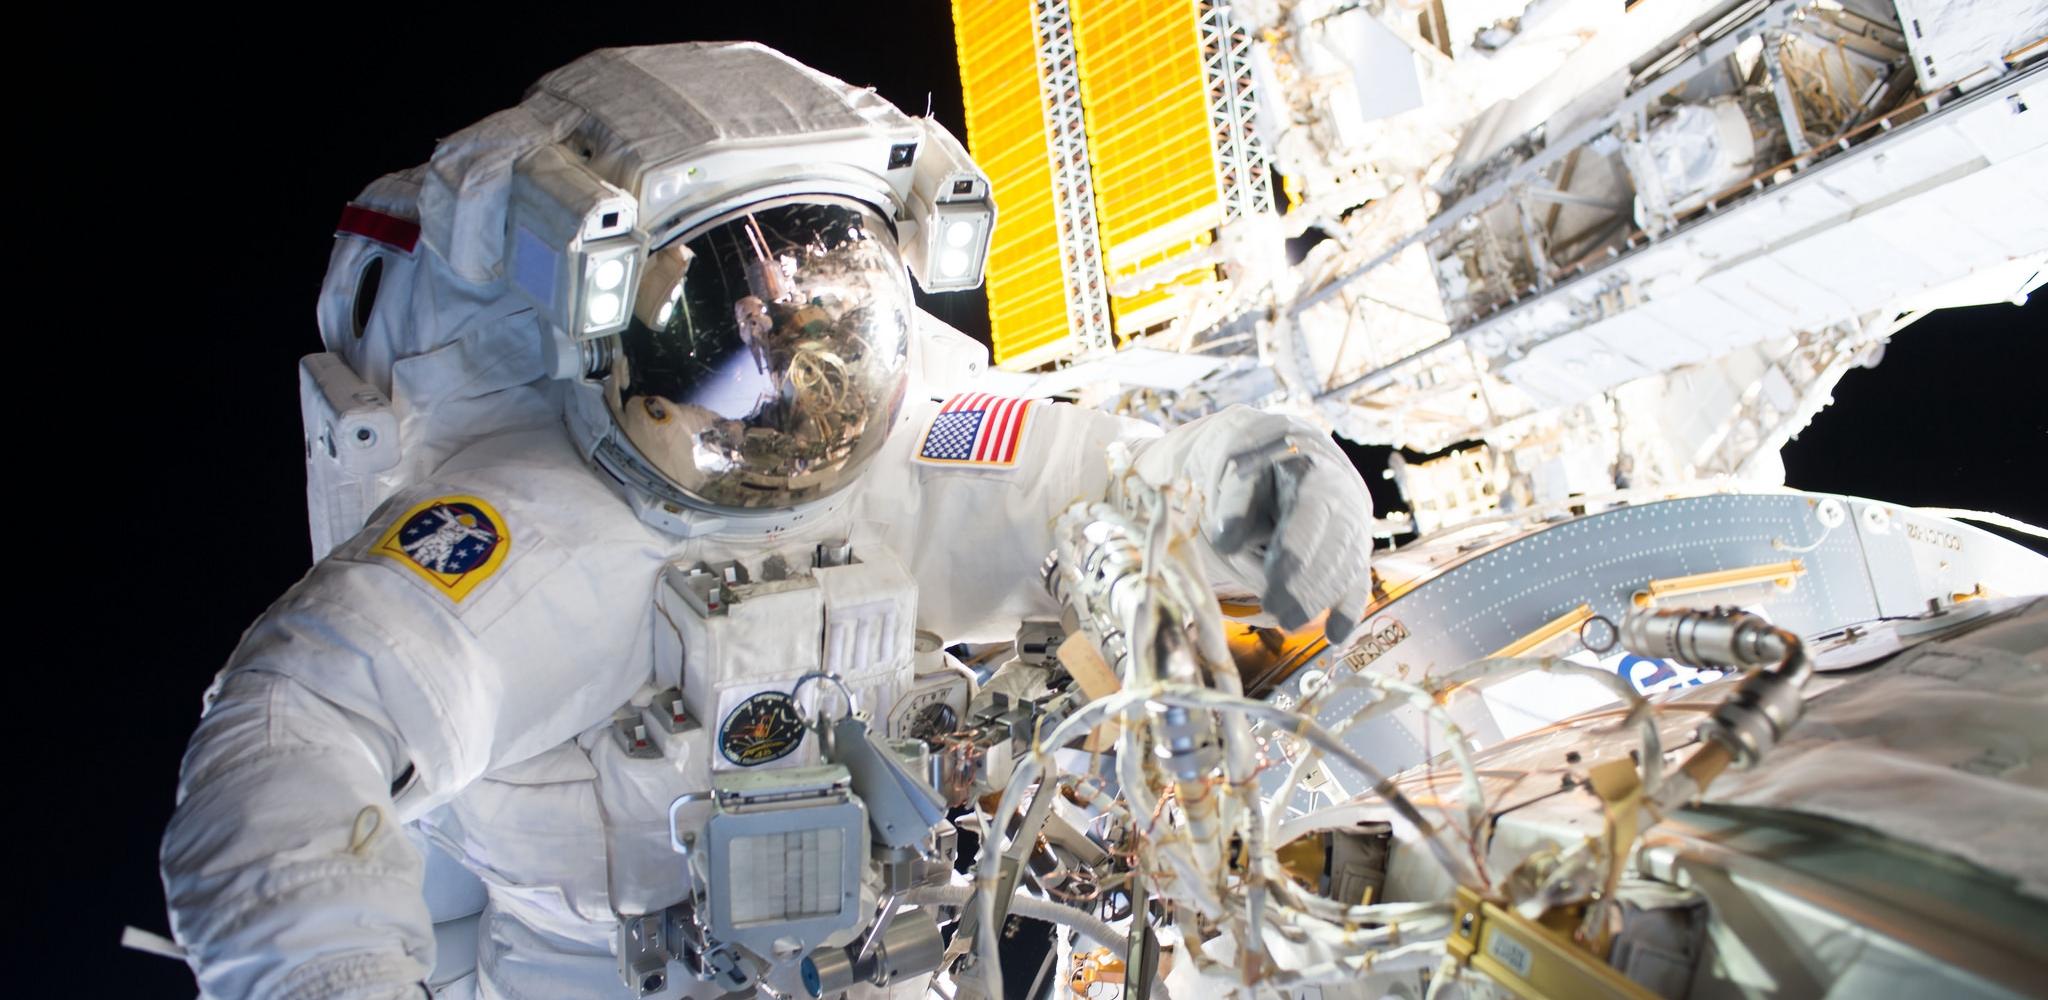 Photo Credit: Kate Rubins / NASA